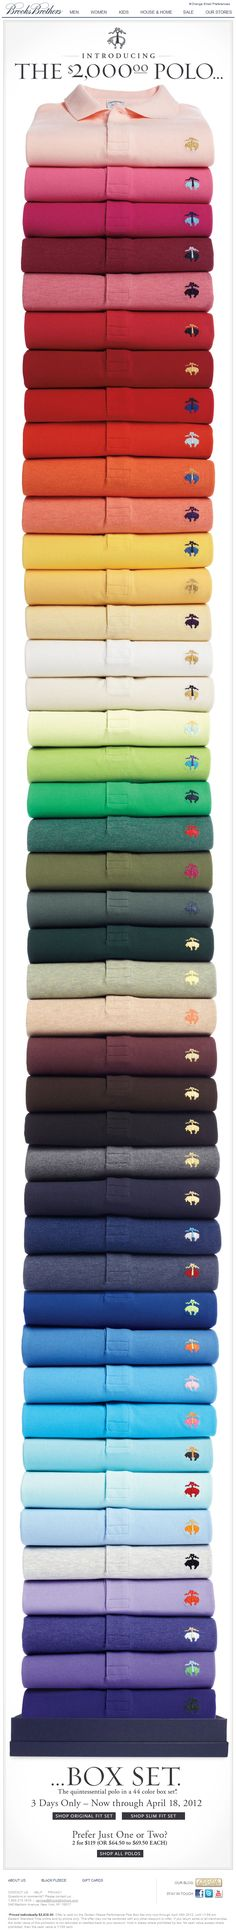 The 44 polo shirt box set